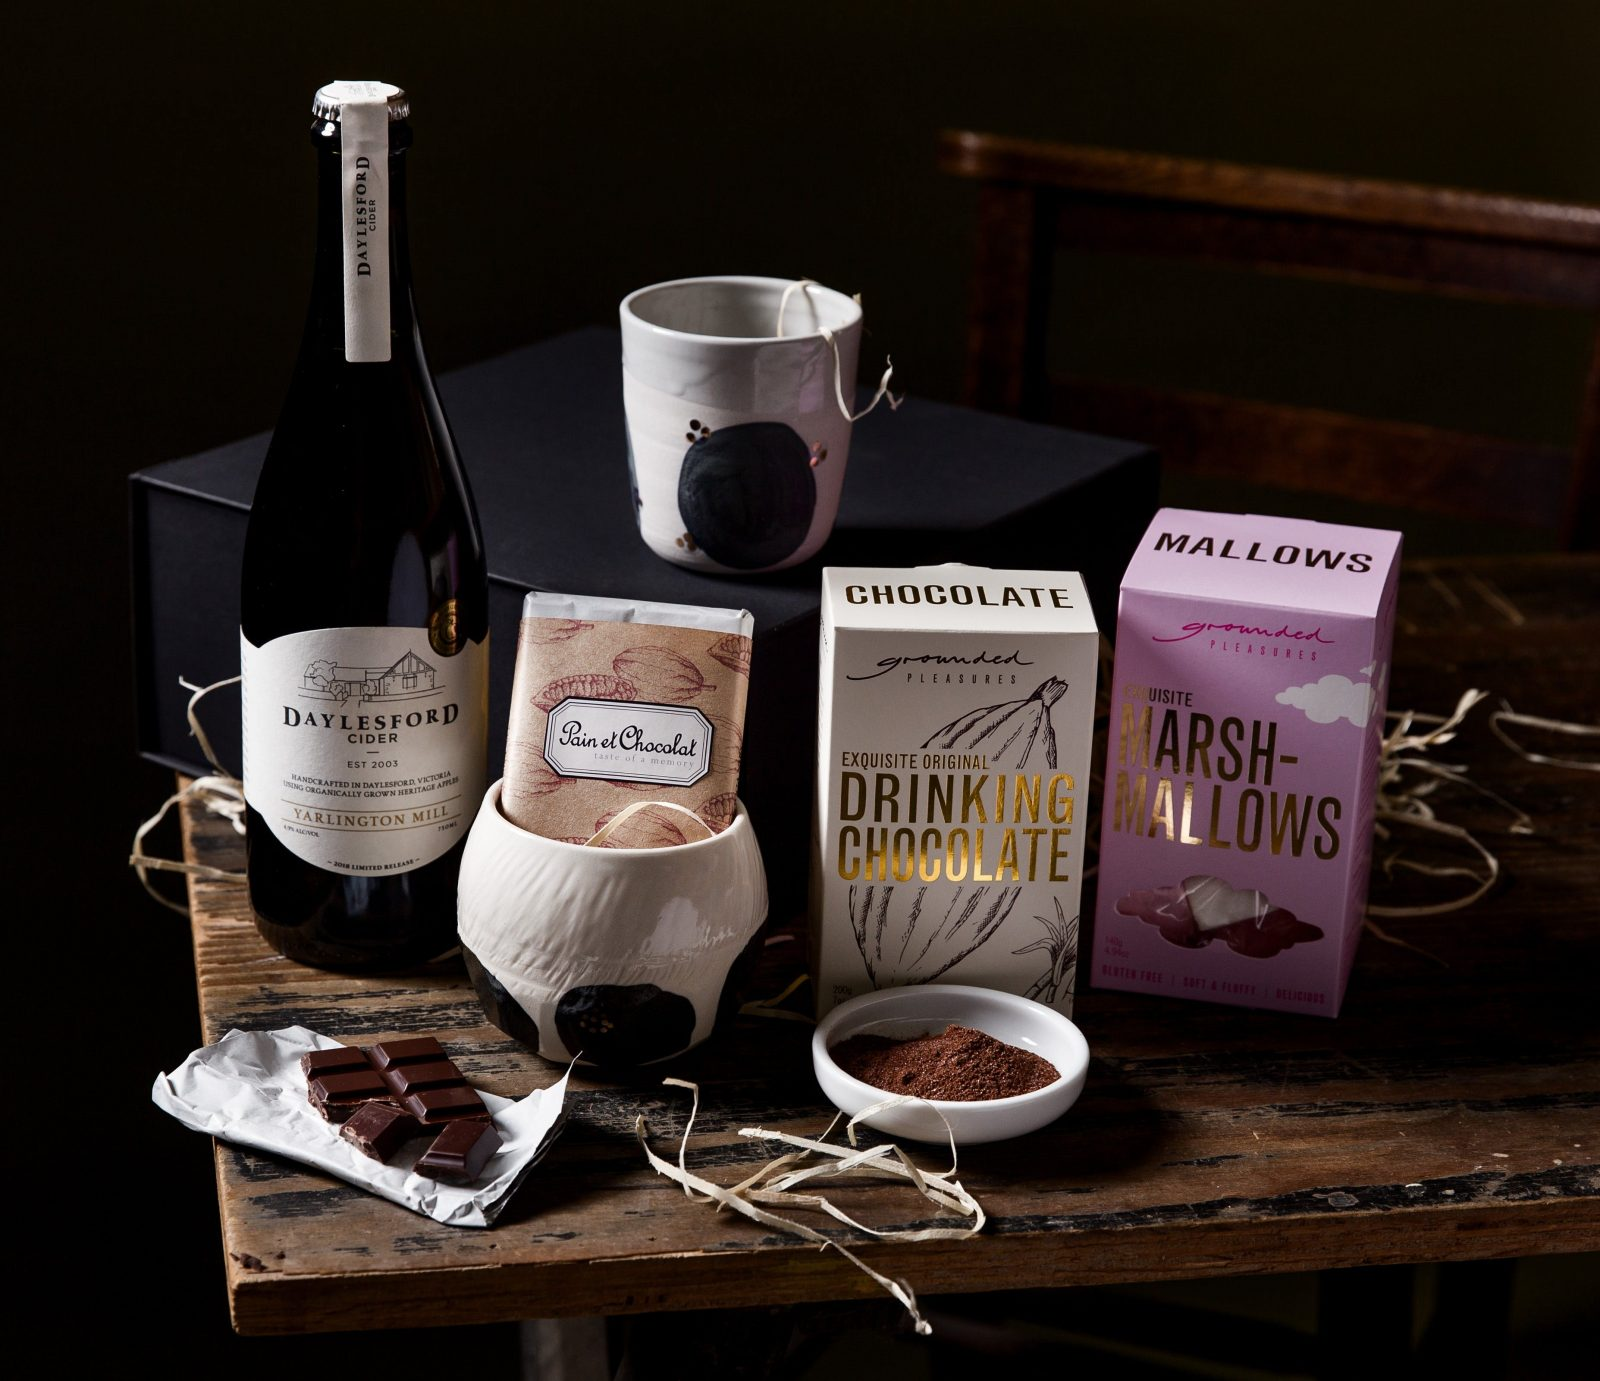 Spiced Cider, Hot chocolate, marshmallows, ceramic beaker, dark chocolate